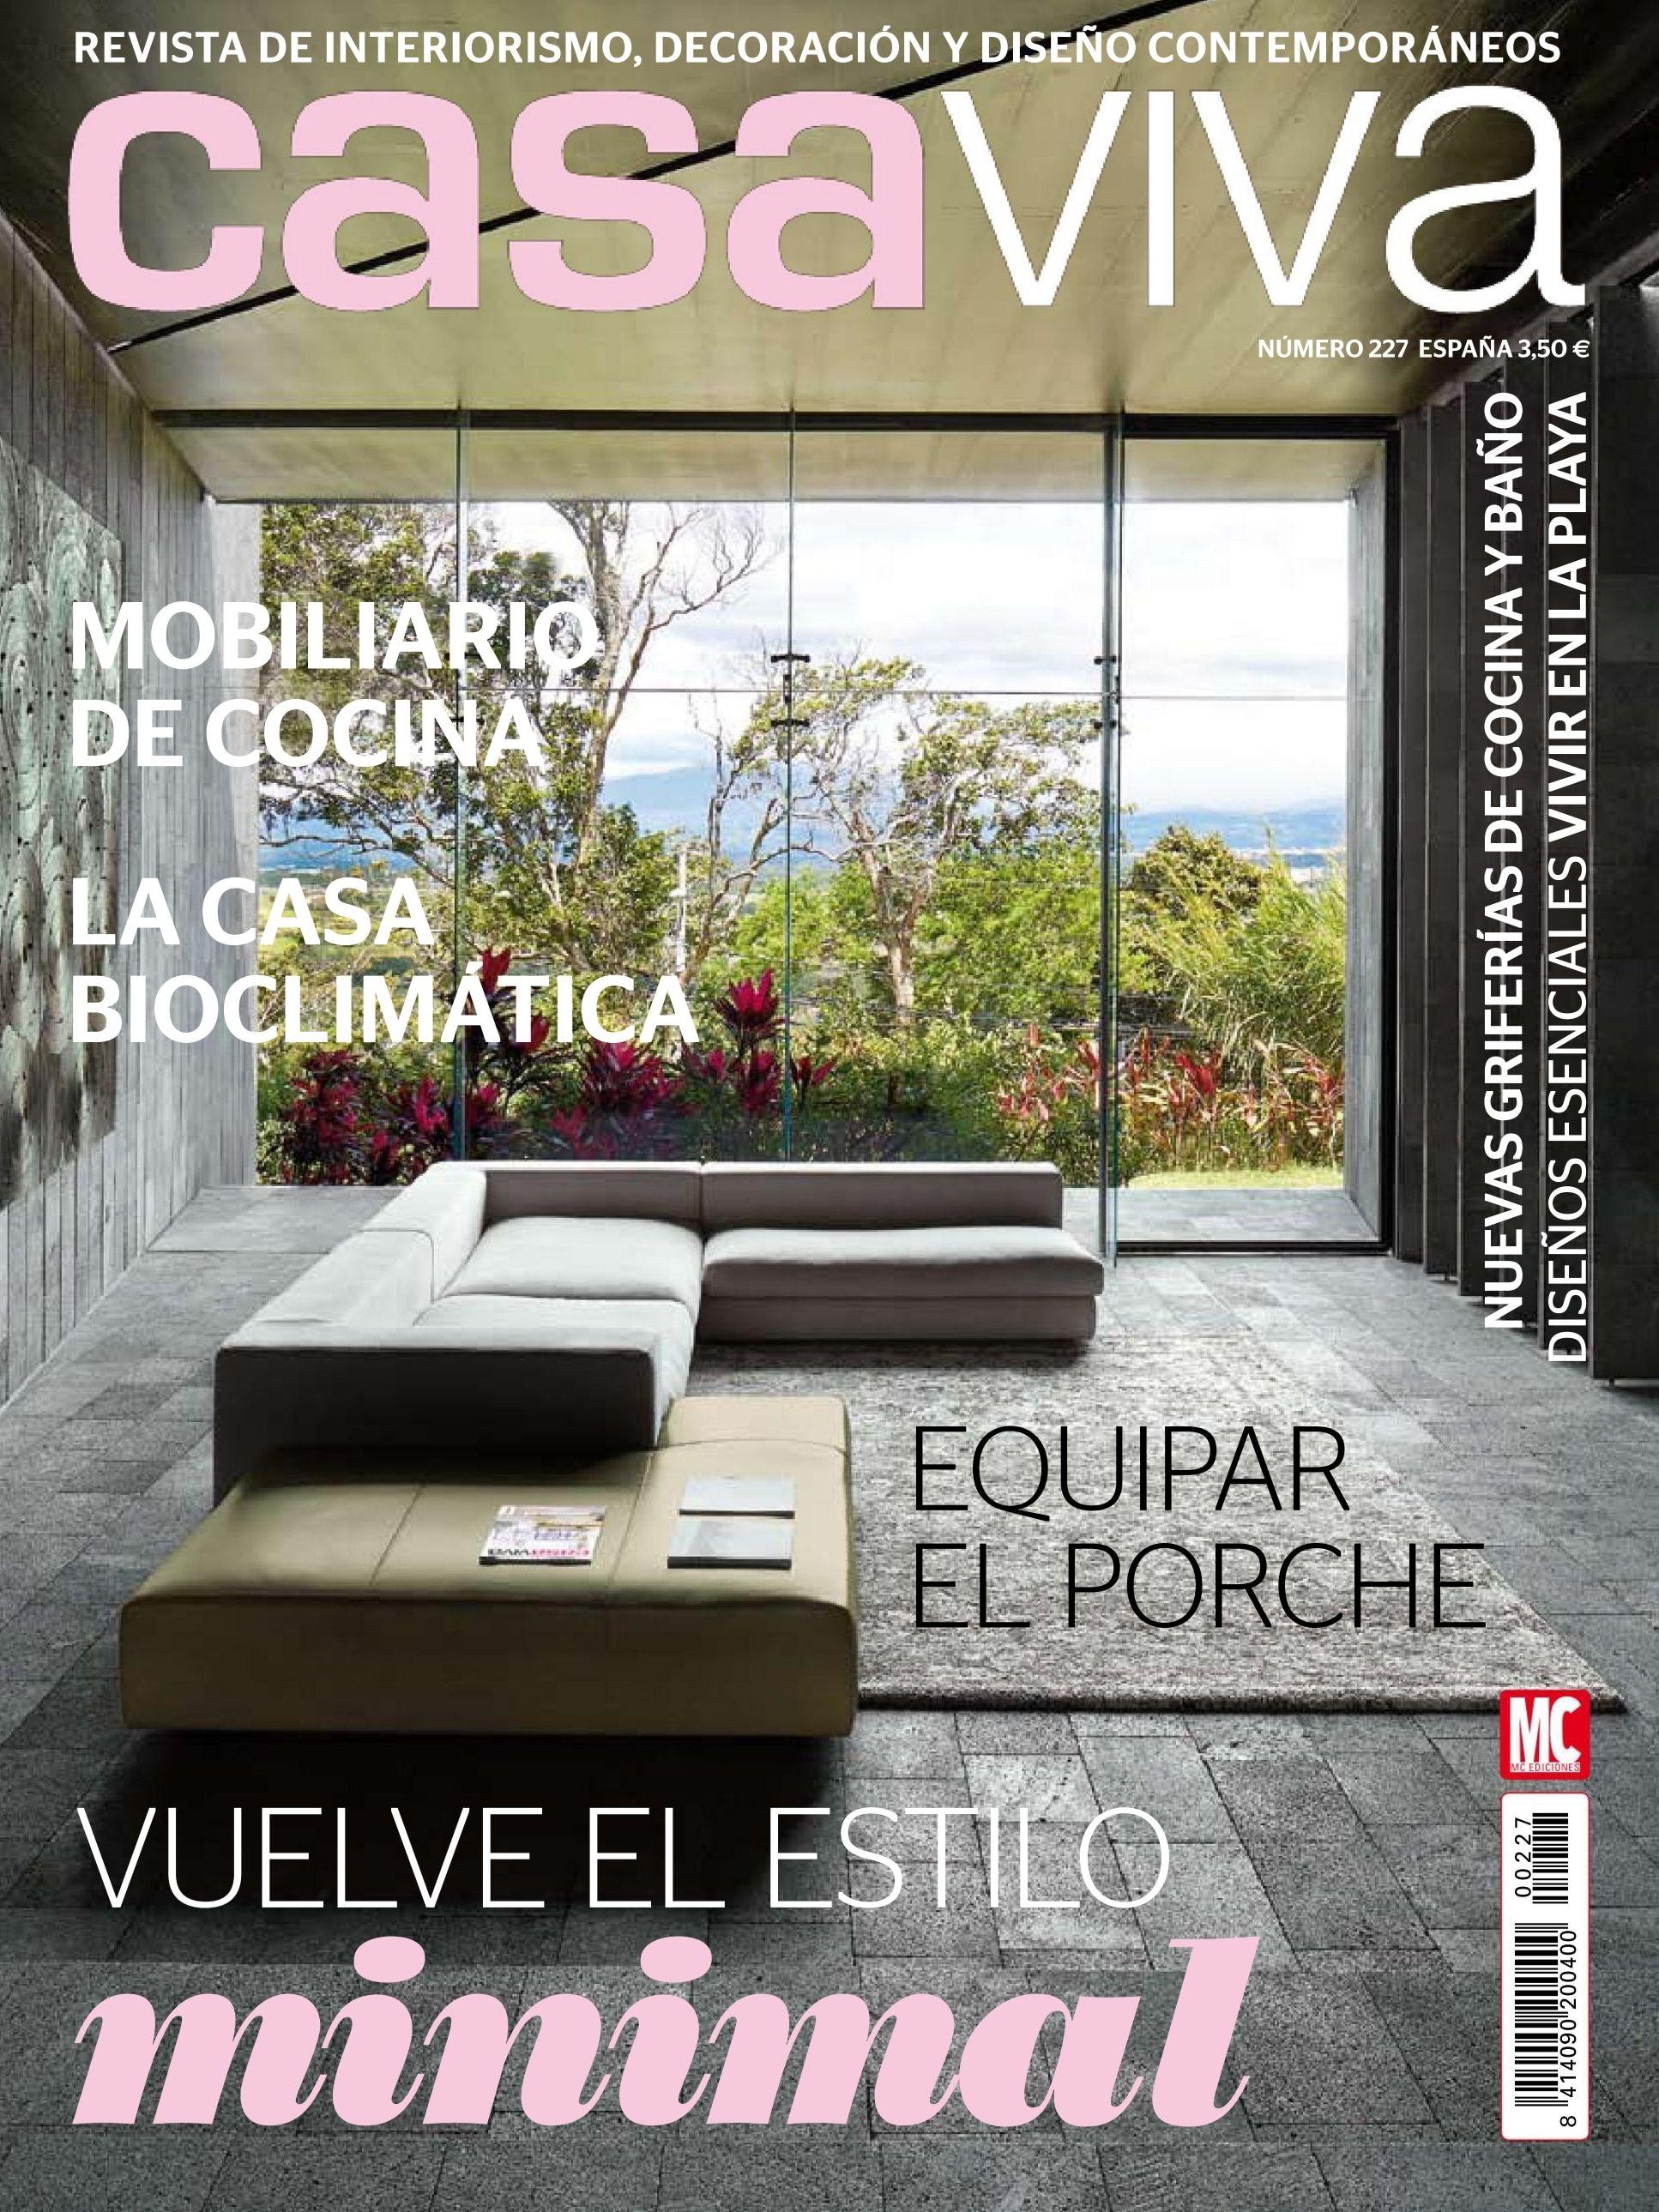 Revista casa viva 227 vuelve el estilo minimal - Casa viva decoracion ...